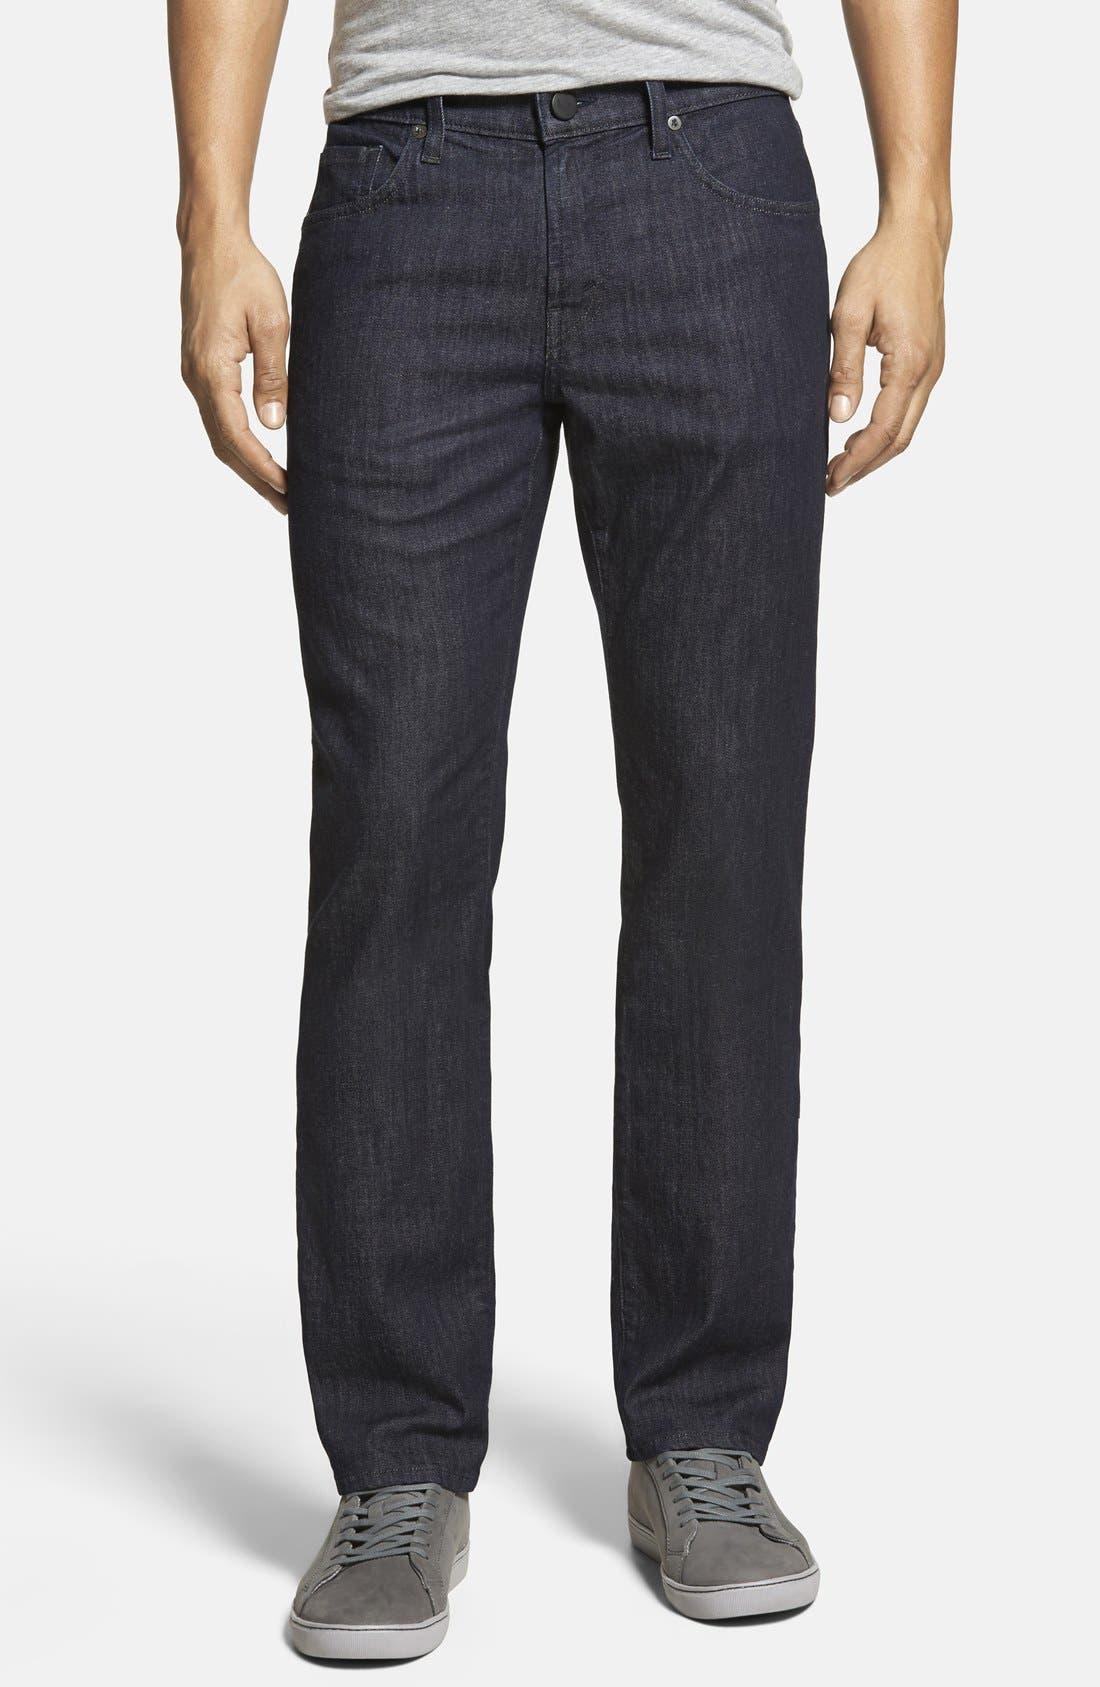 Kane Slim Straight Leg Jeans,                             Main thumbnail 1, color,                             HIRSCH